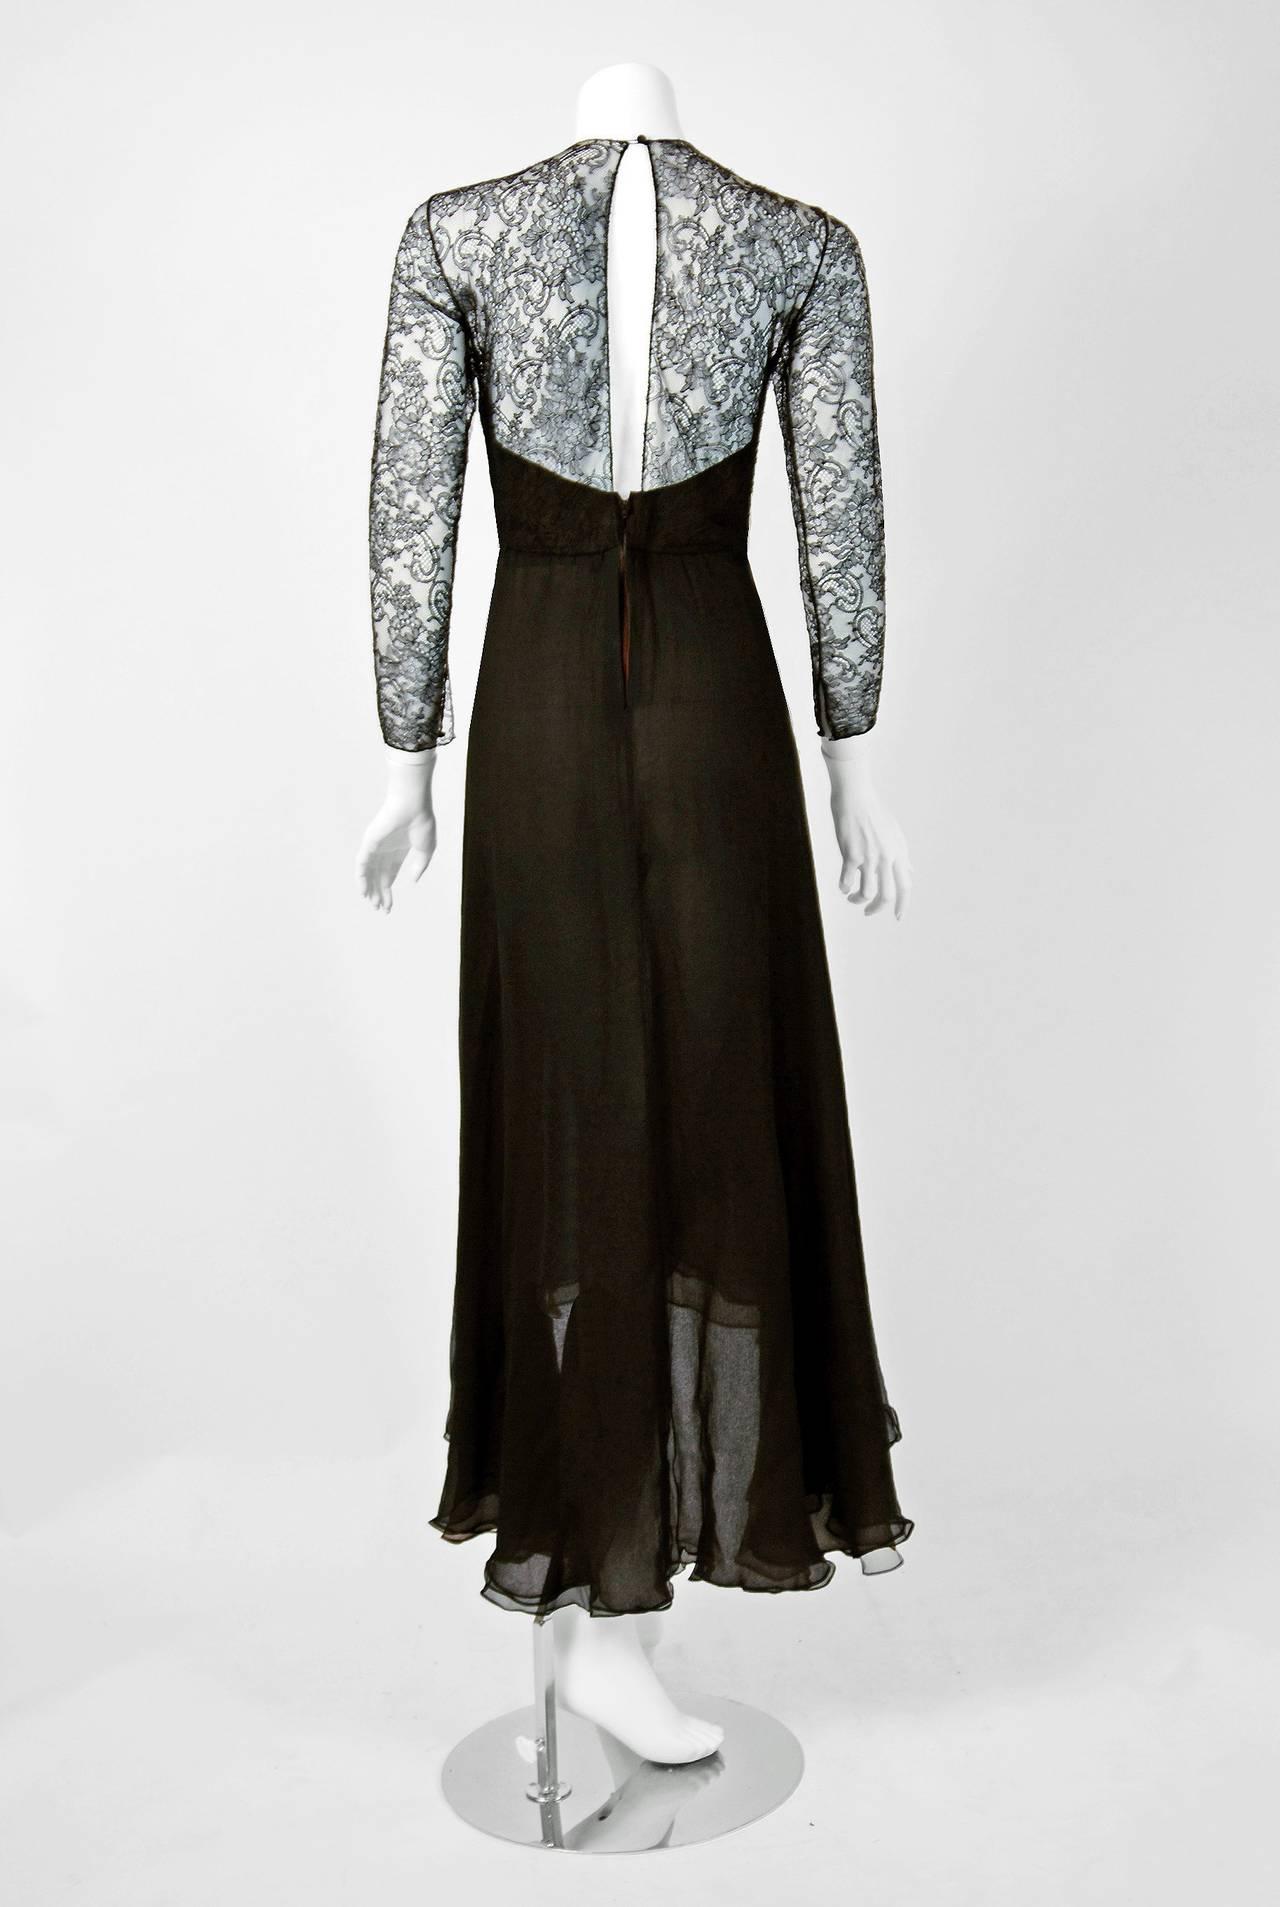 Women's 1990's Oscar de la Renta Black Lace Illusion & Mocha Silk-Chiffon Sculpted Dress For Sale